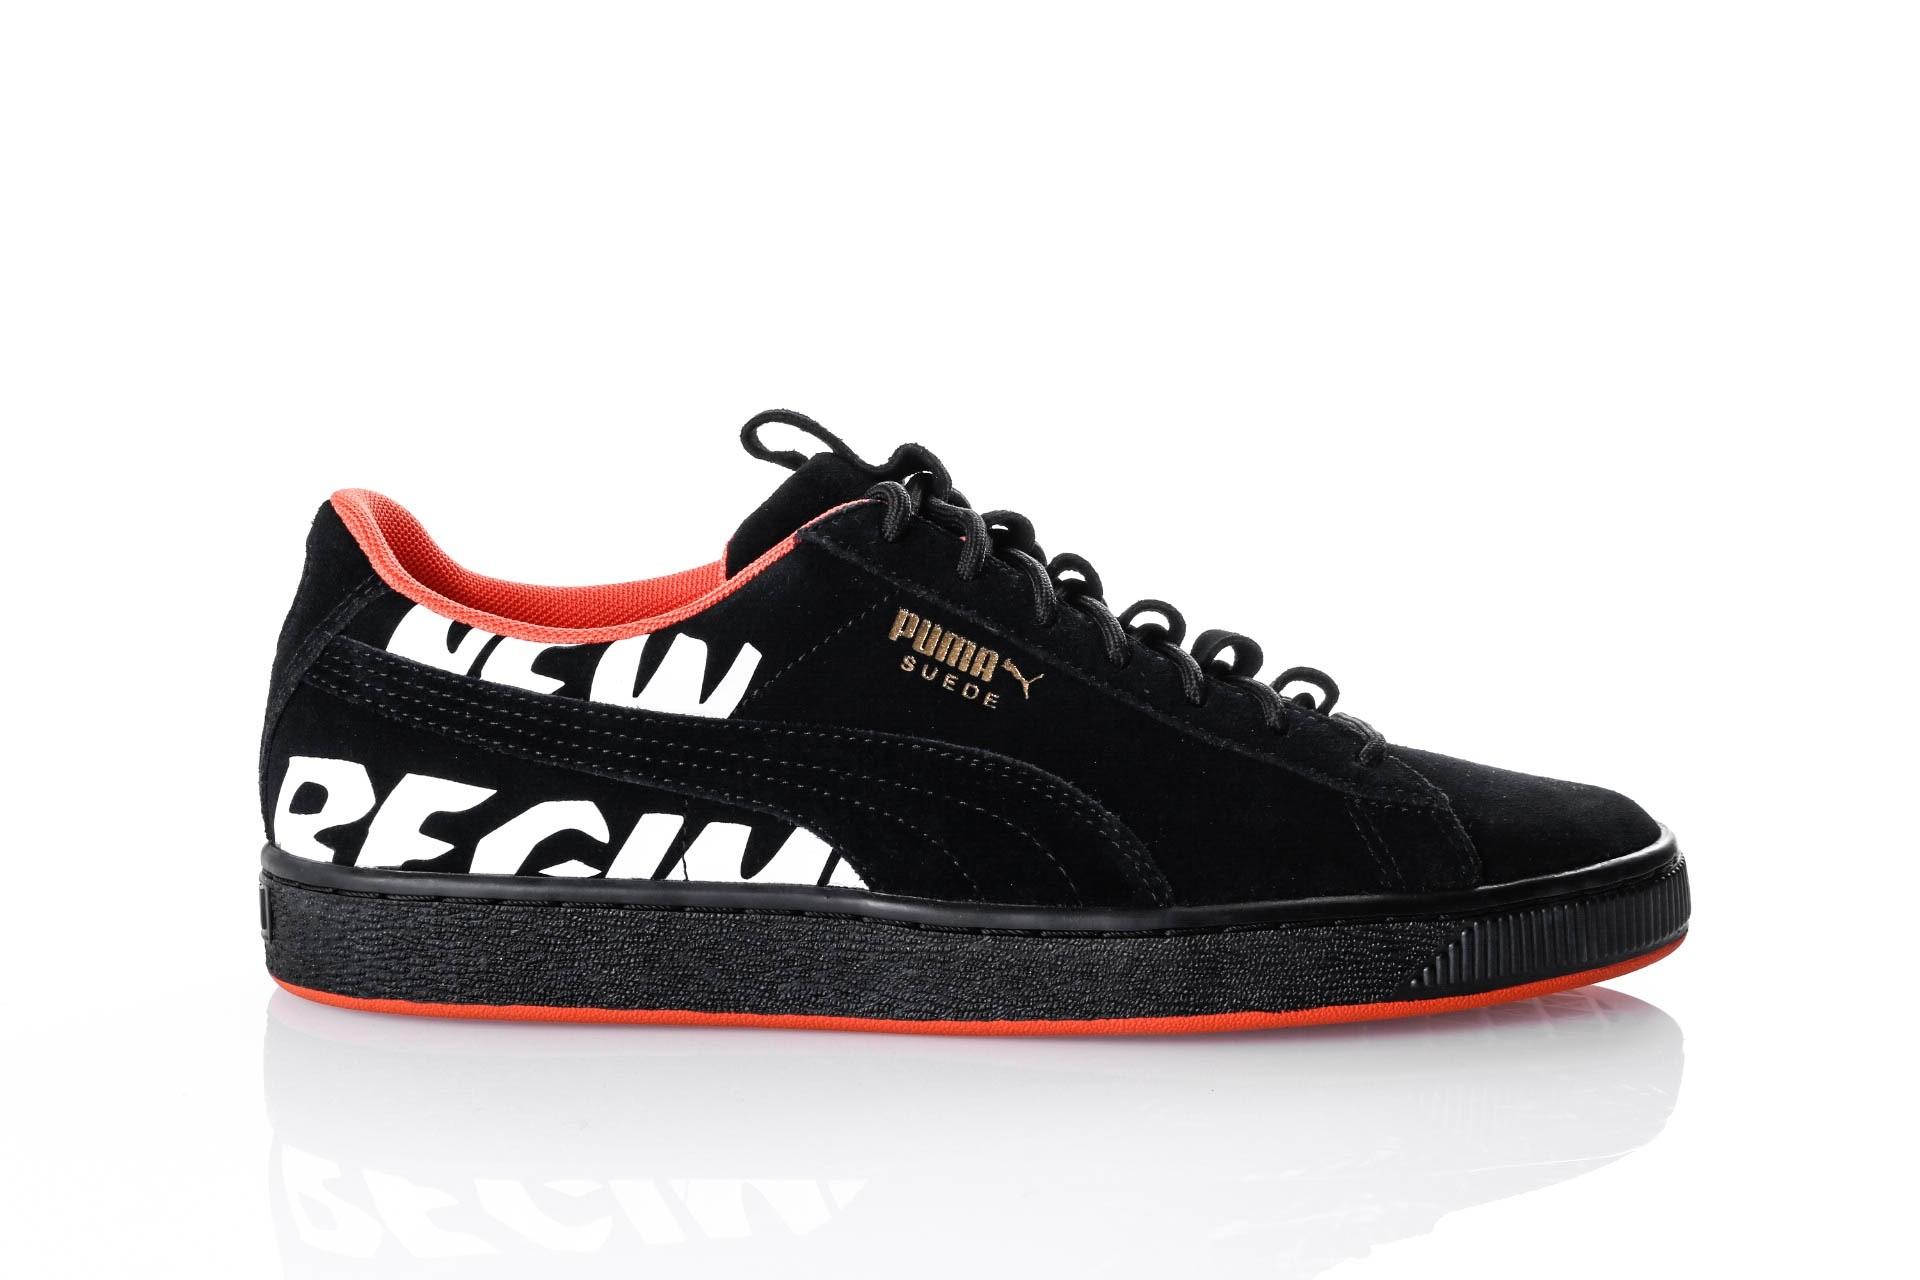 Foto van Puma Suede ANR 366534 Sneakers puma black-puma black